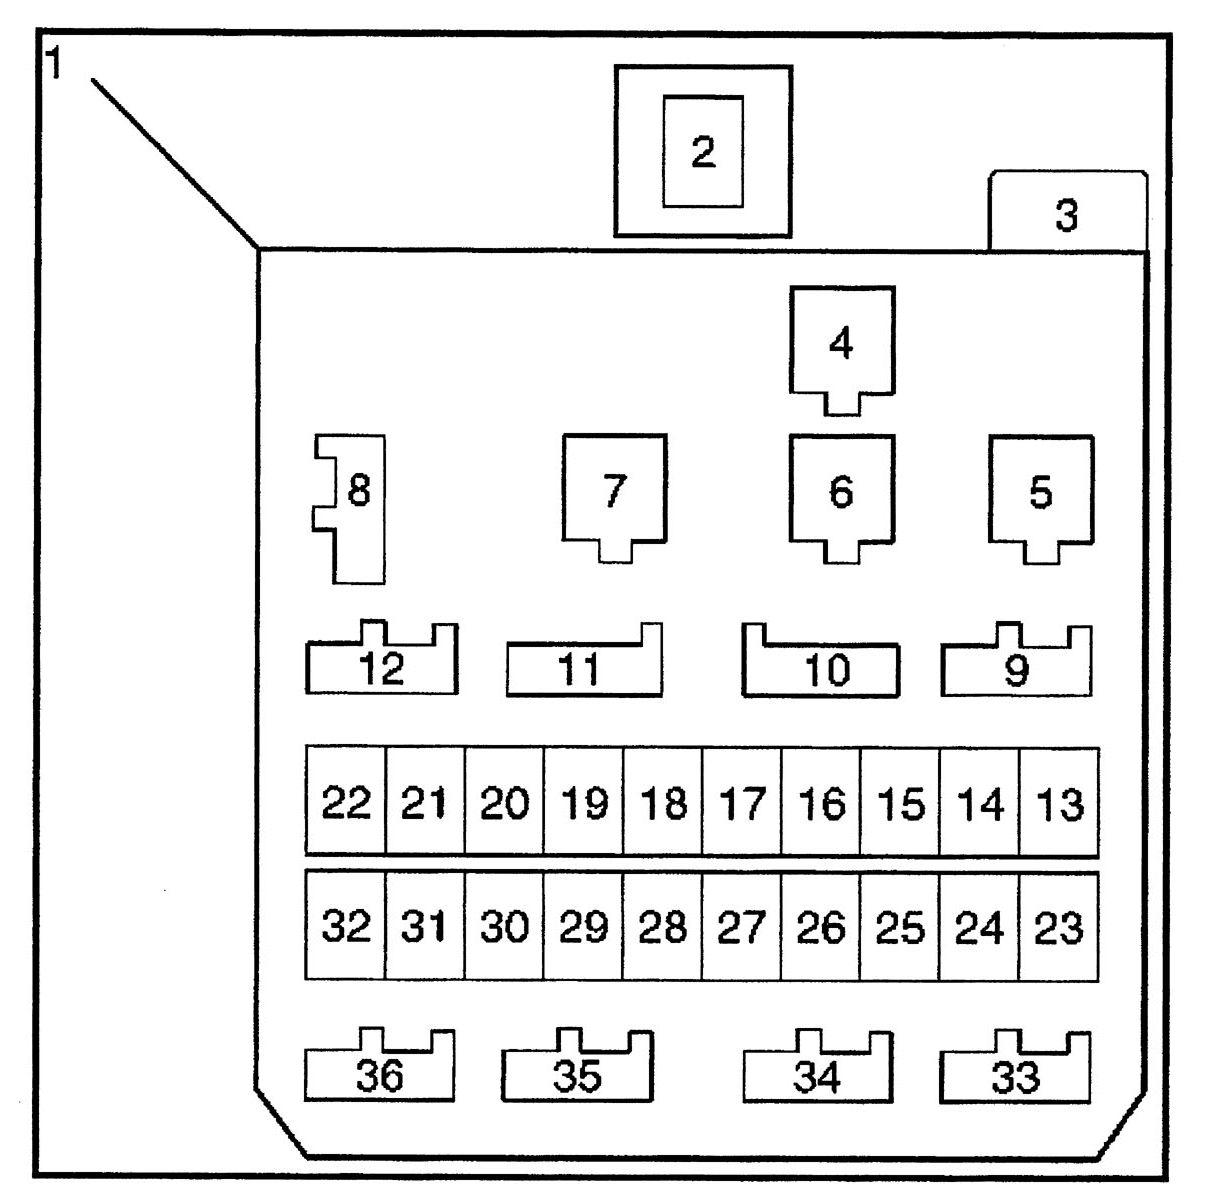 isuzu trooper power window relay diagram